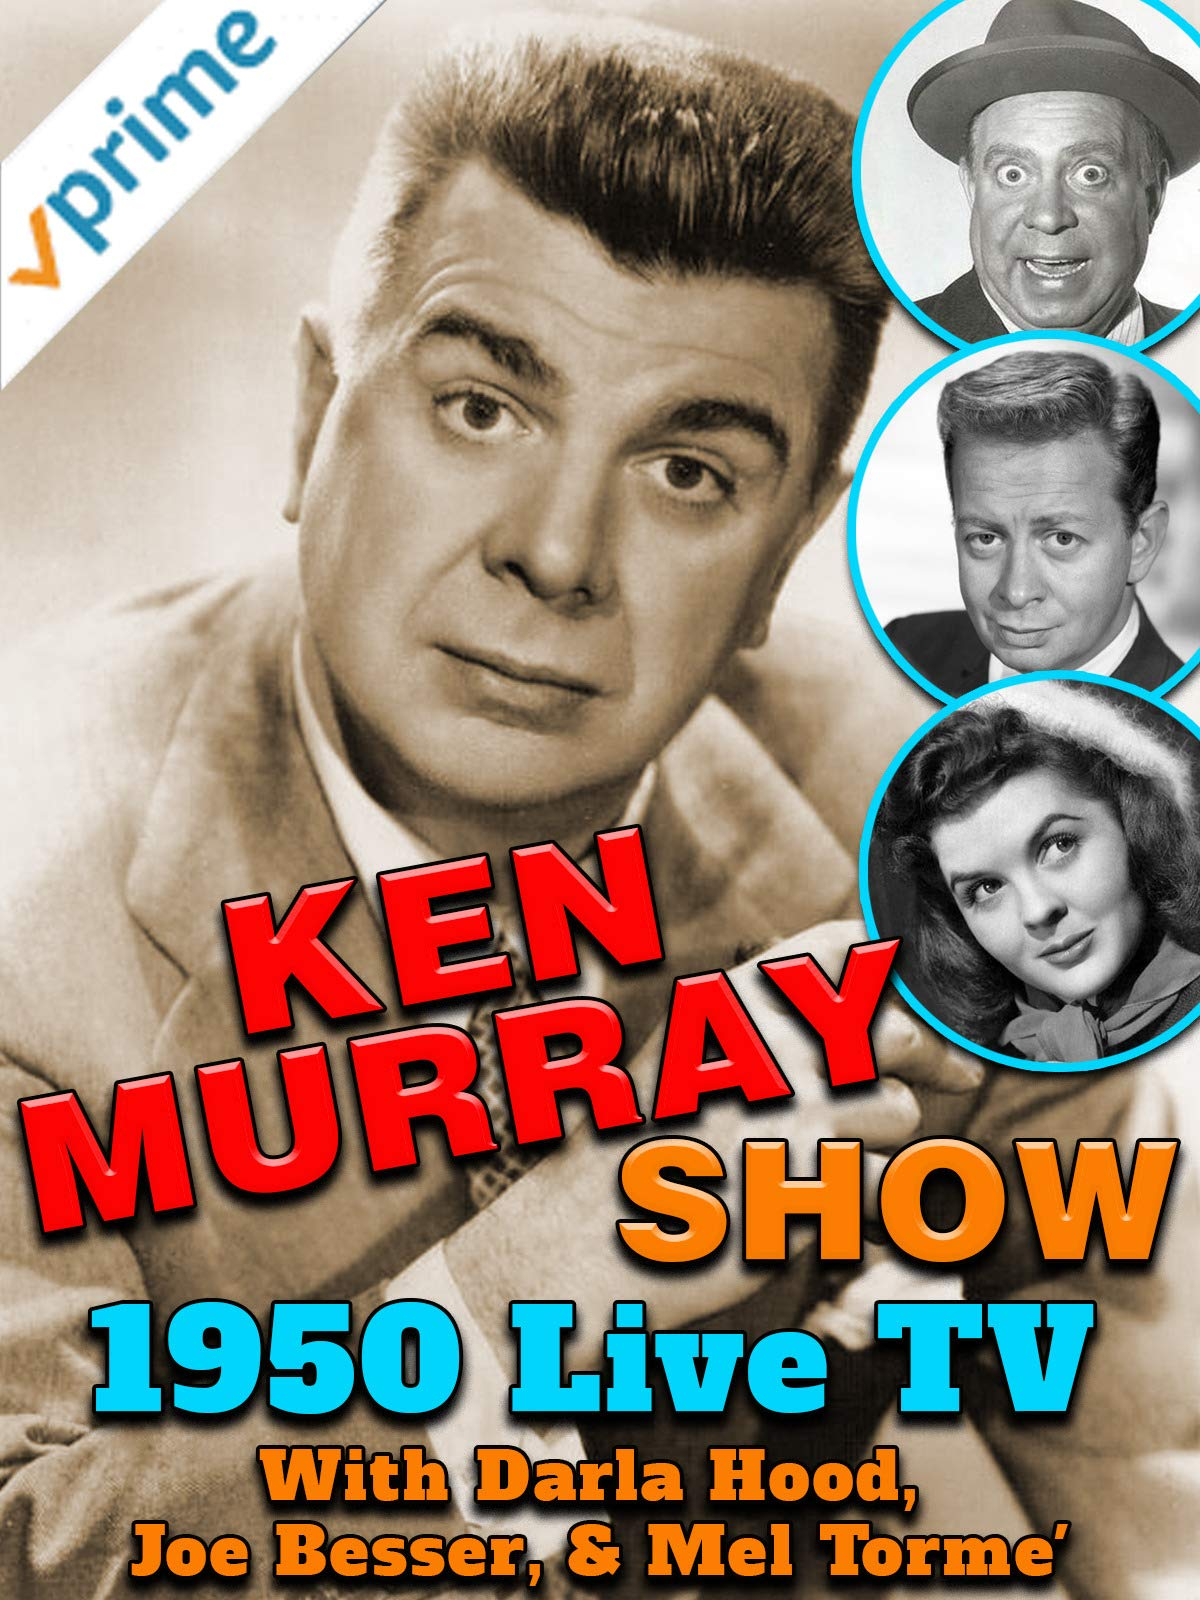 Ken Murray Show - 1950 Live TV, With Darla Hood, Joe Besser, & Mel Torme'